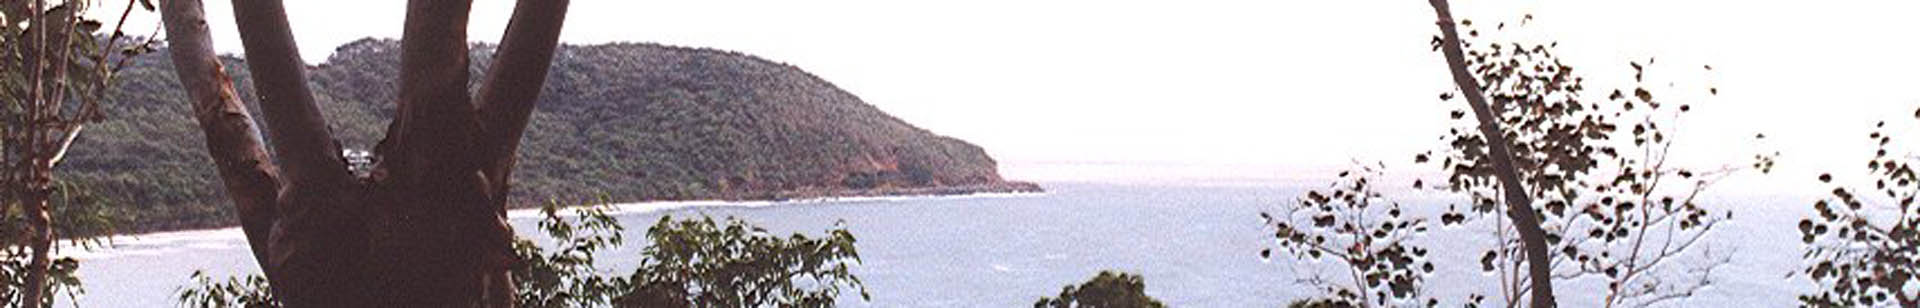 Port Douglas 1920x308